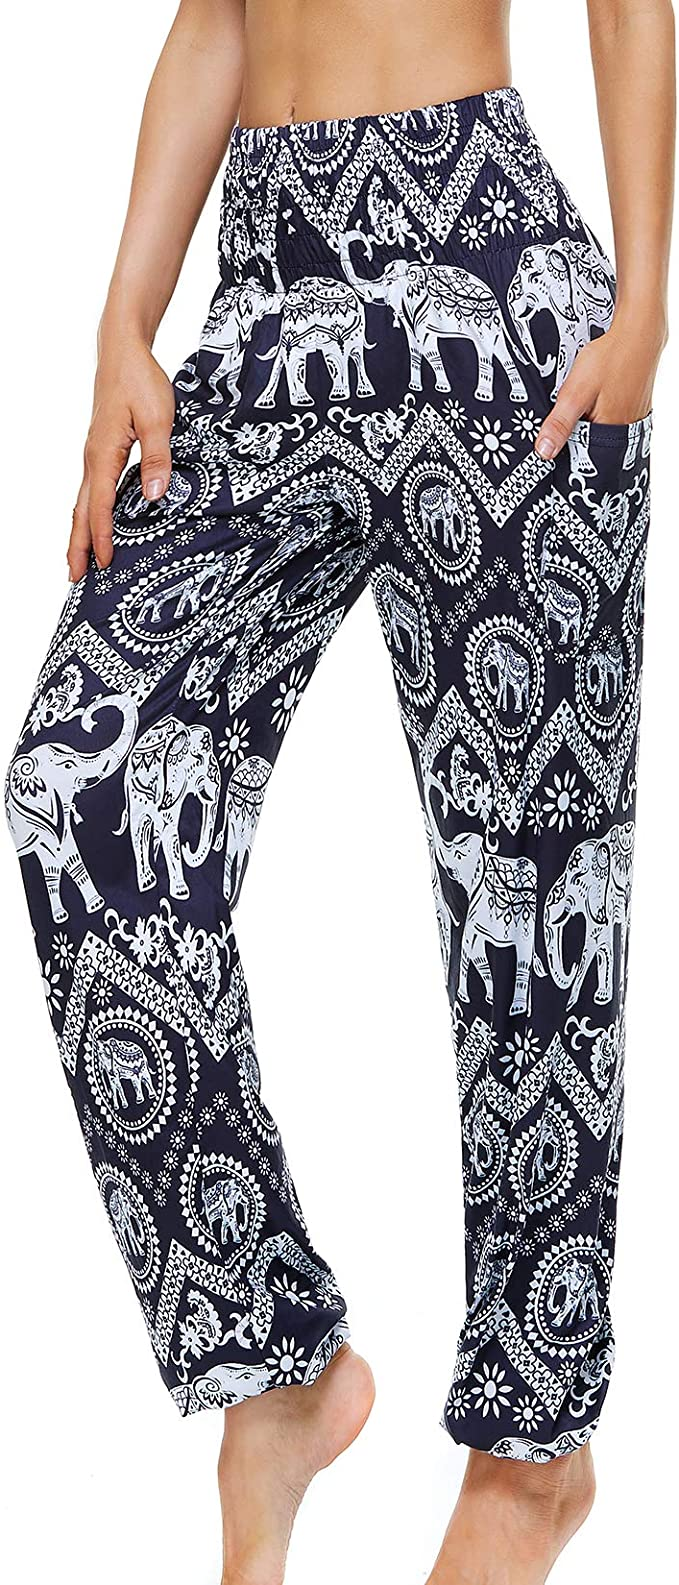 Lu's Chic Women's Harem Boho Pants Genie Hippie Yoga Pants Cotton Bohemian Smocked Waist Loose